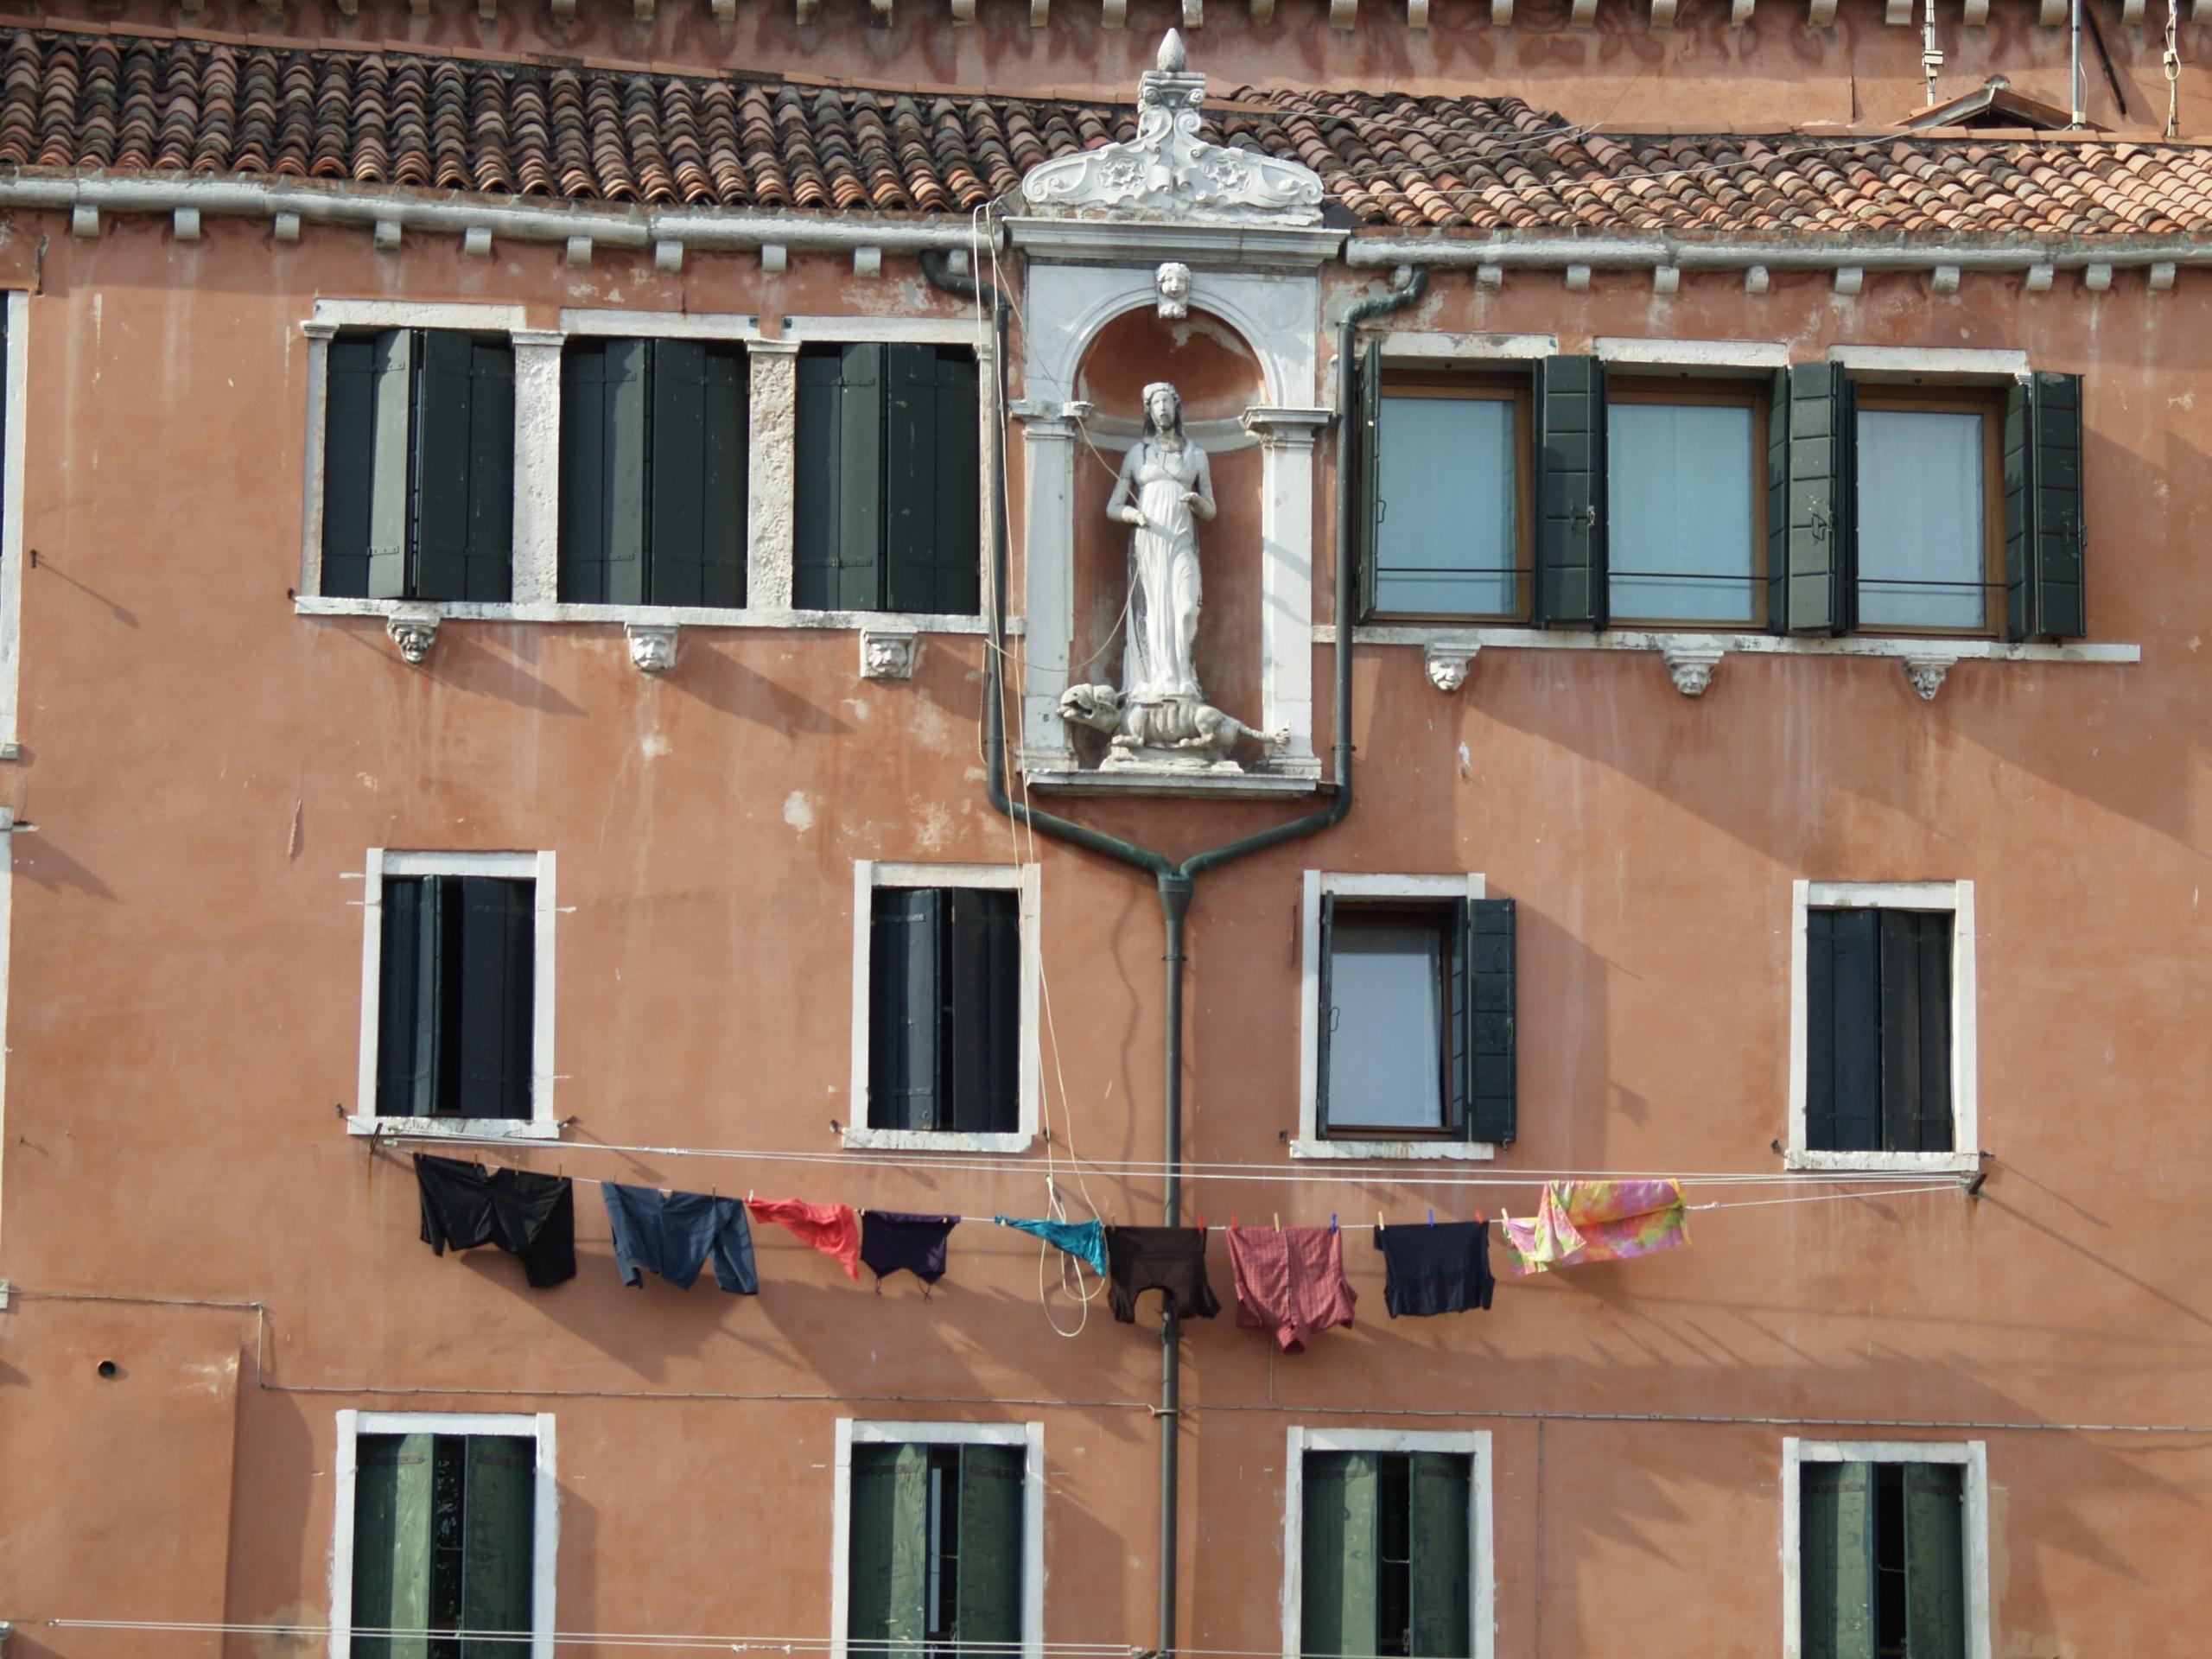 sacred profane - venice, italy, architecture - robertmclake | ello